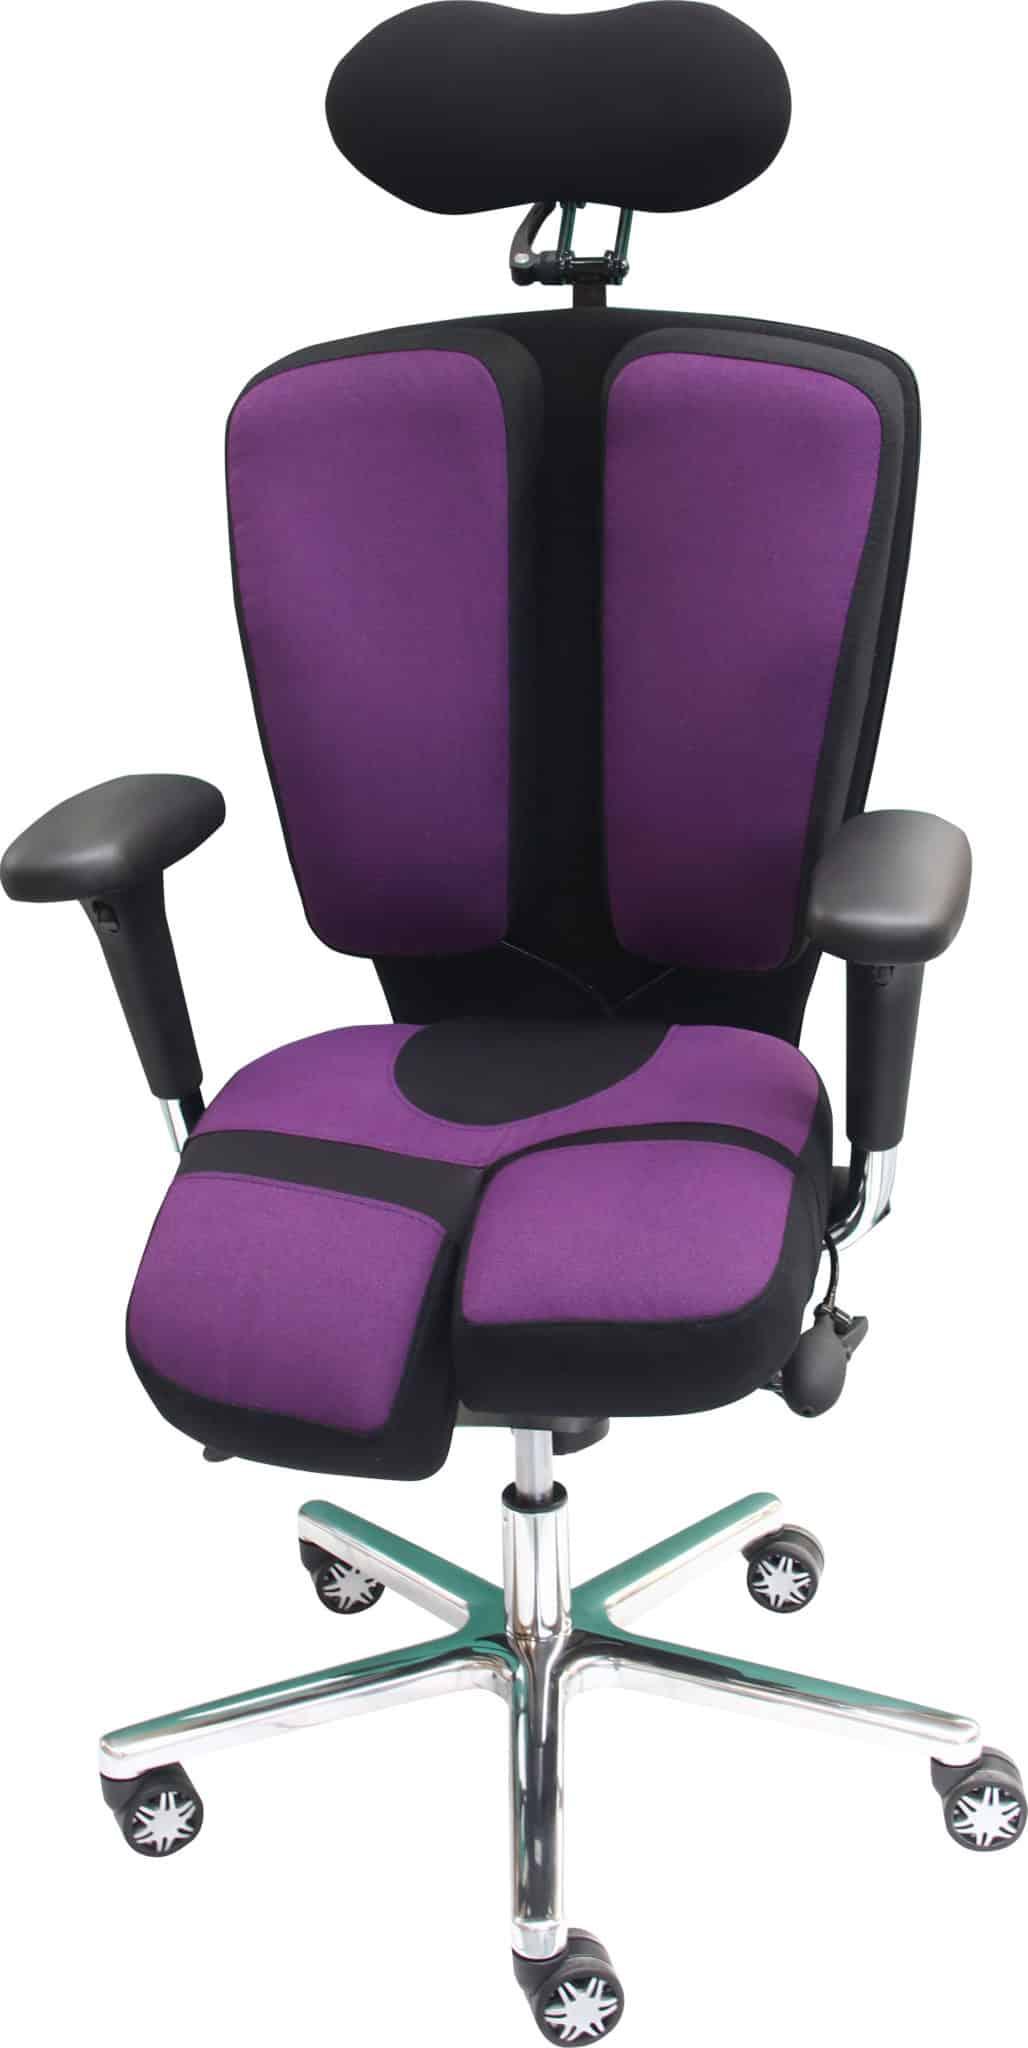 KHOL PERINEOS 7 siege ergonomic environnement médical